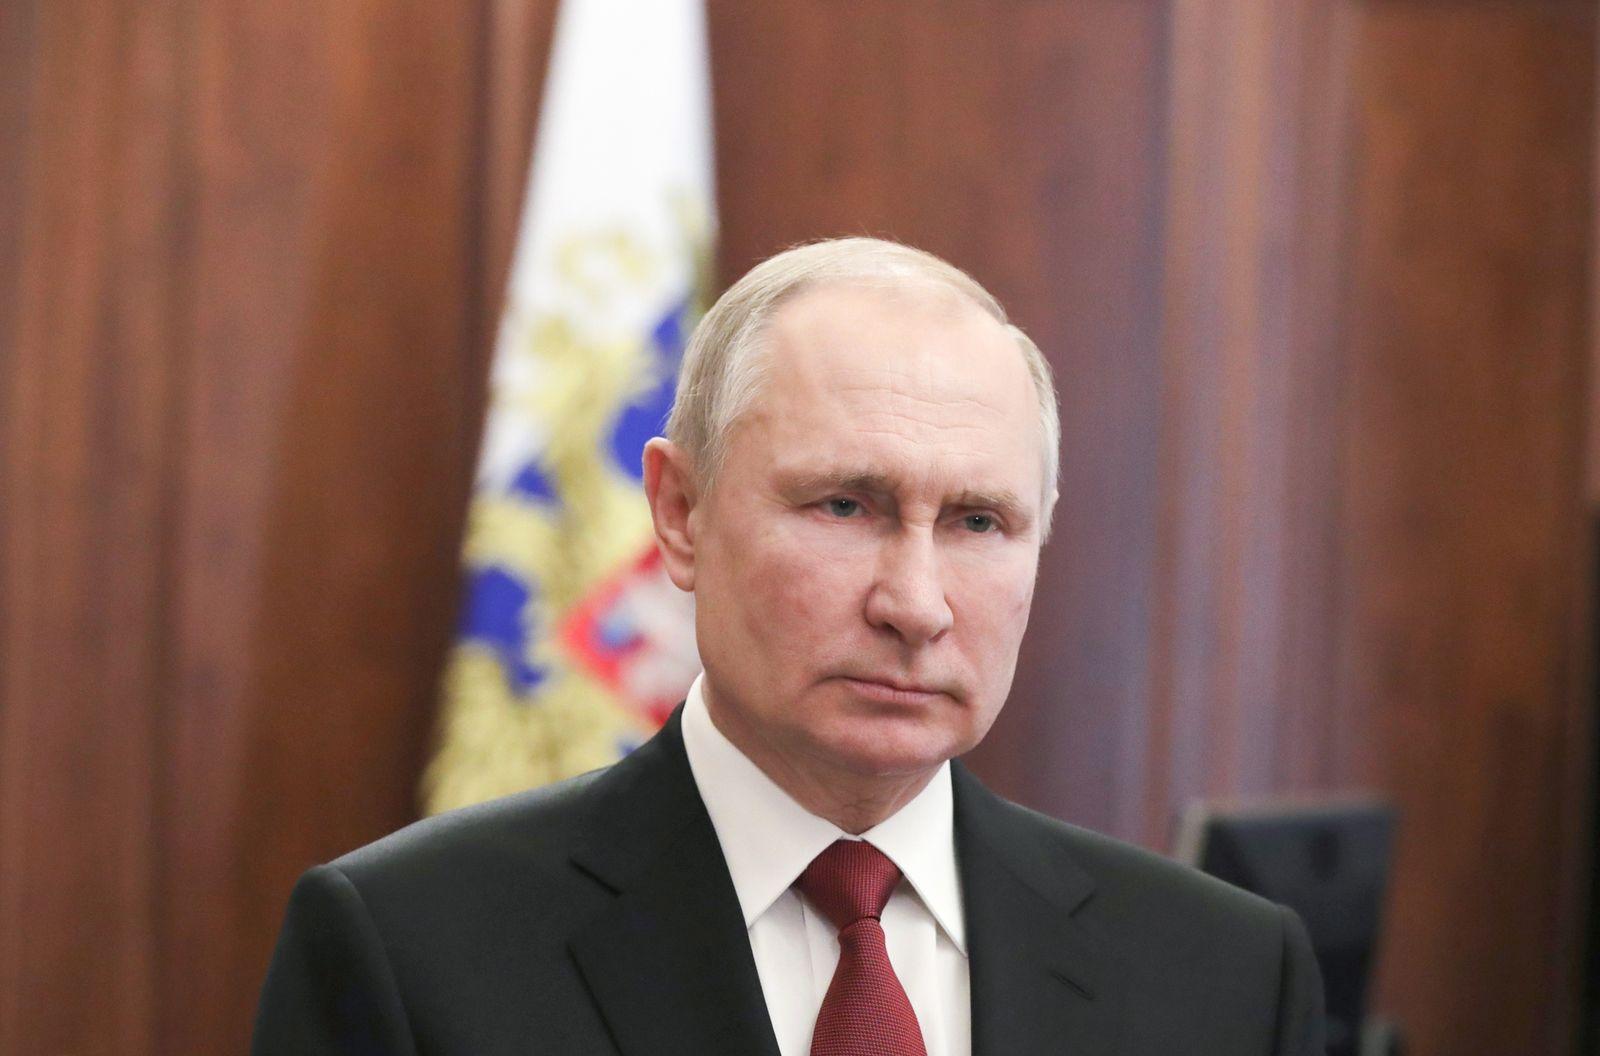 Russian President Vladimir Putin speaks via video on Defender of the Fatherland Day